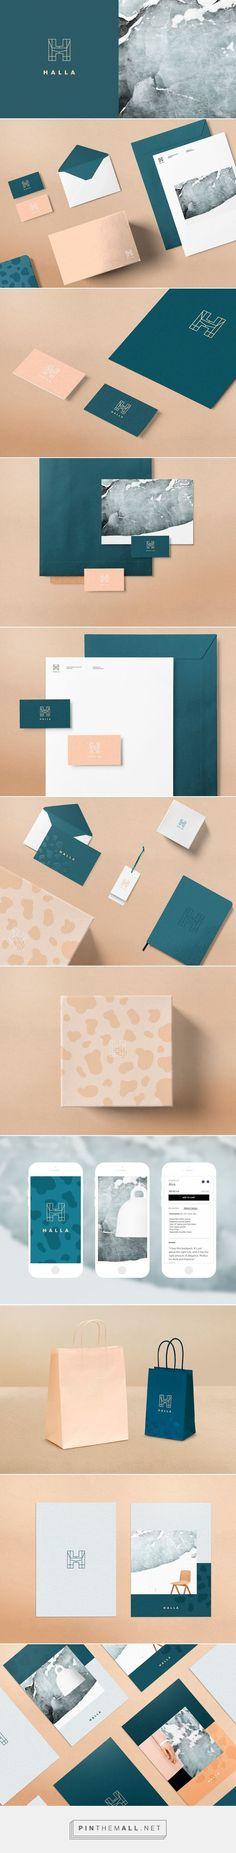 Halla Fashion and Furniture Shop branding design by Tiia Vahla. Web Design Agency, Brand Identity Design, Graphic Design Branding, Corporate Design, Corporate Branding, Brand Packaging, Packaging Design, Style Board, Web Design Mobile